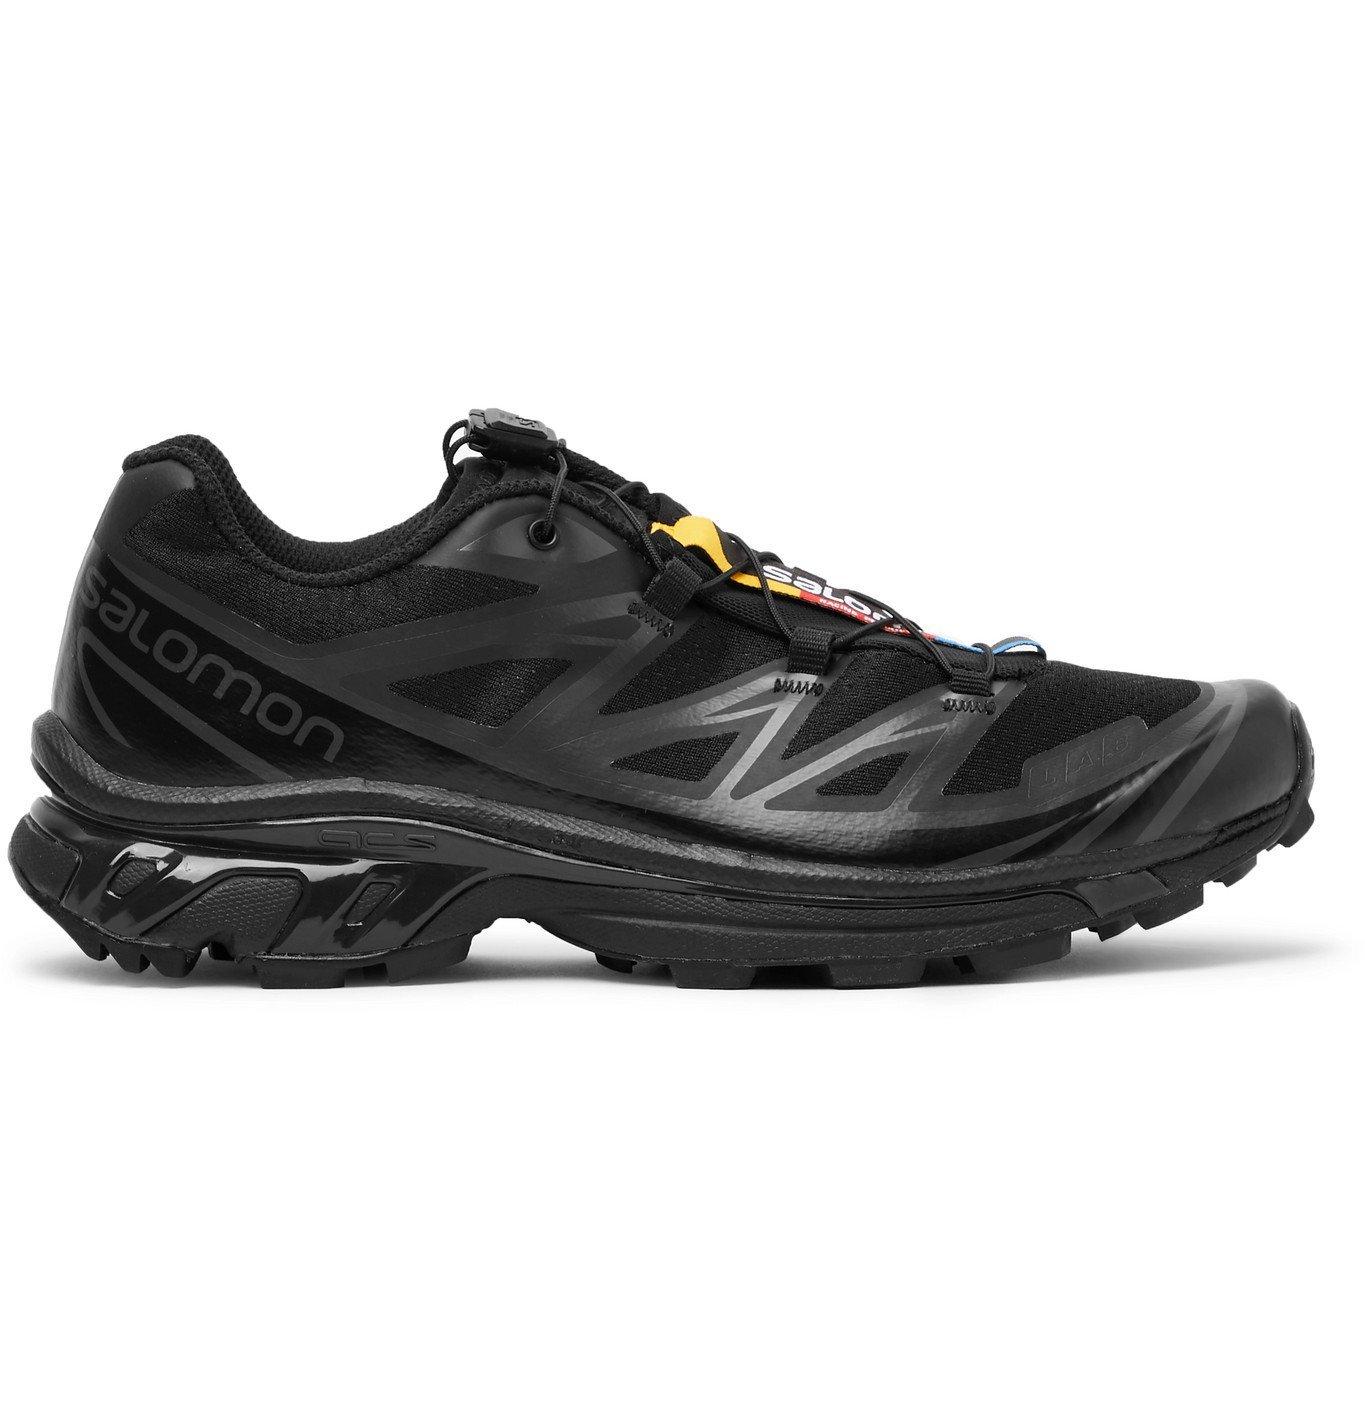 Photo: Salomon - XT-6 ADV Mesh and Rubber Running Sneakers - Black